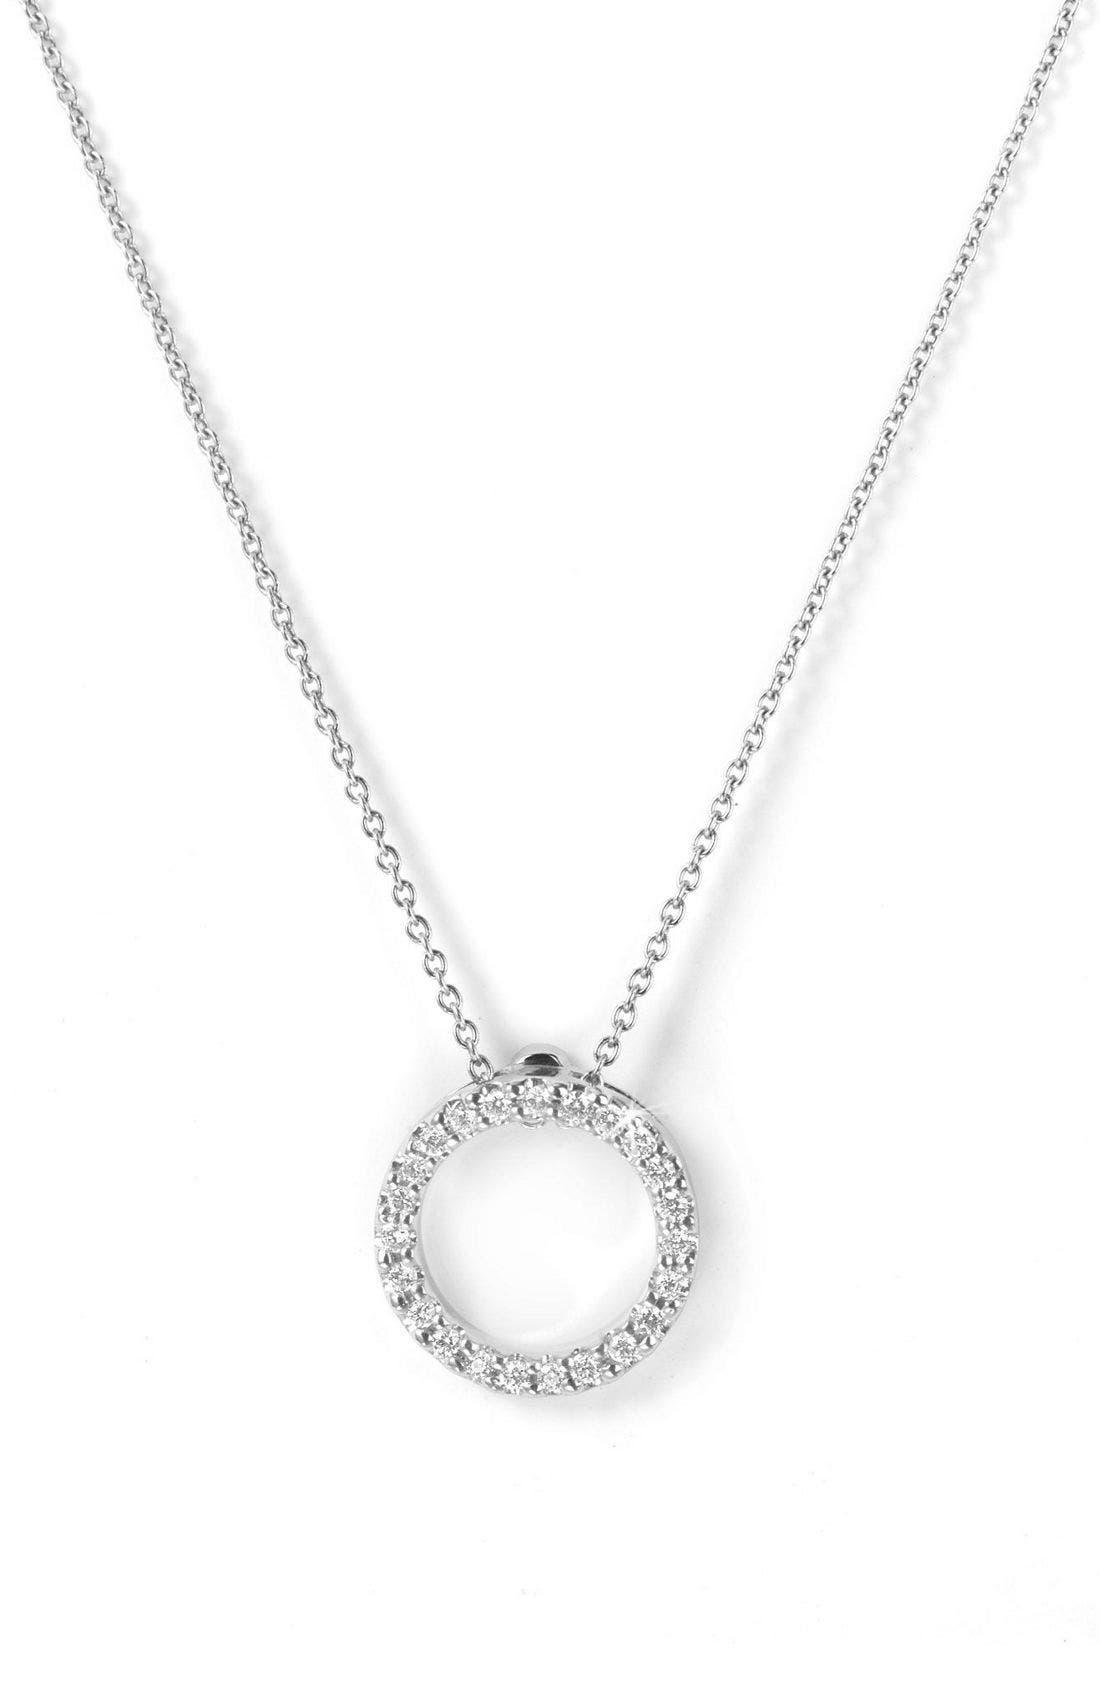 Roberto Coin 'Tiny Treasures' Small Diamond Circle Pendant Necklace